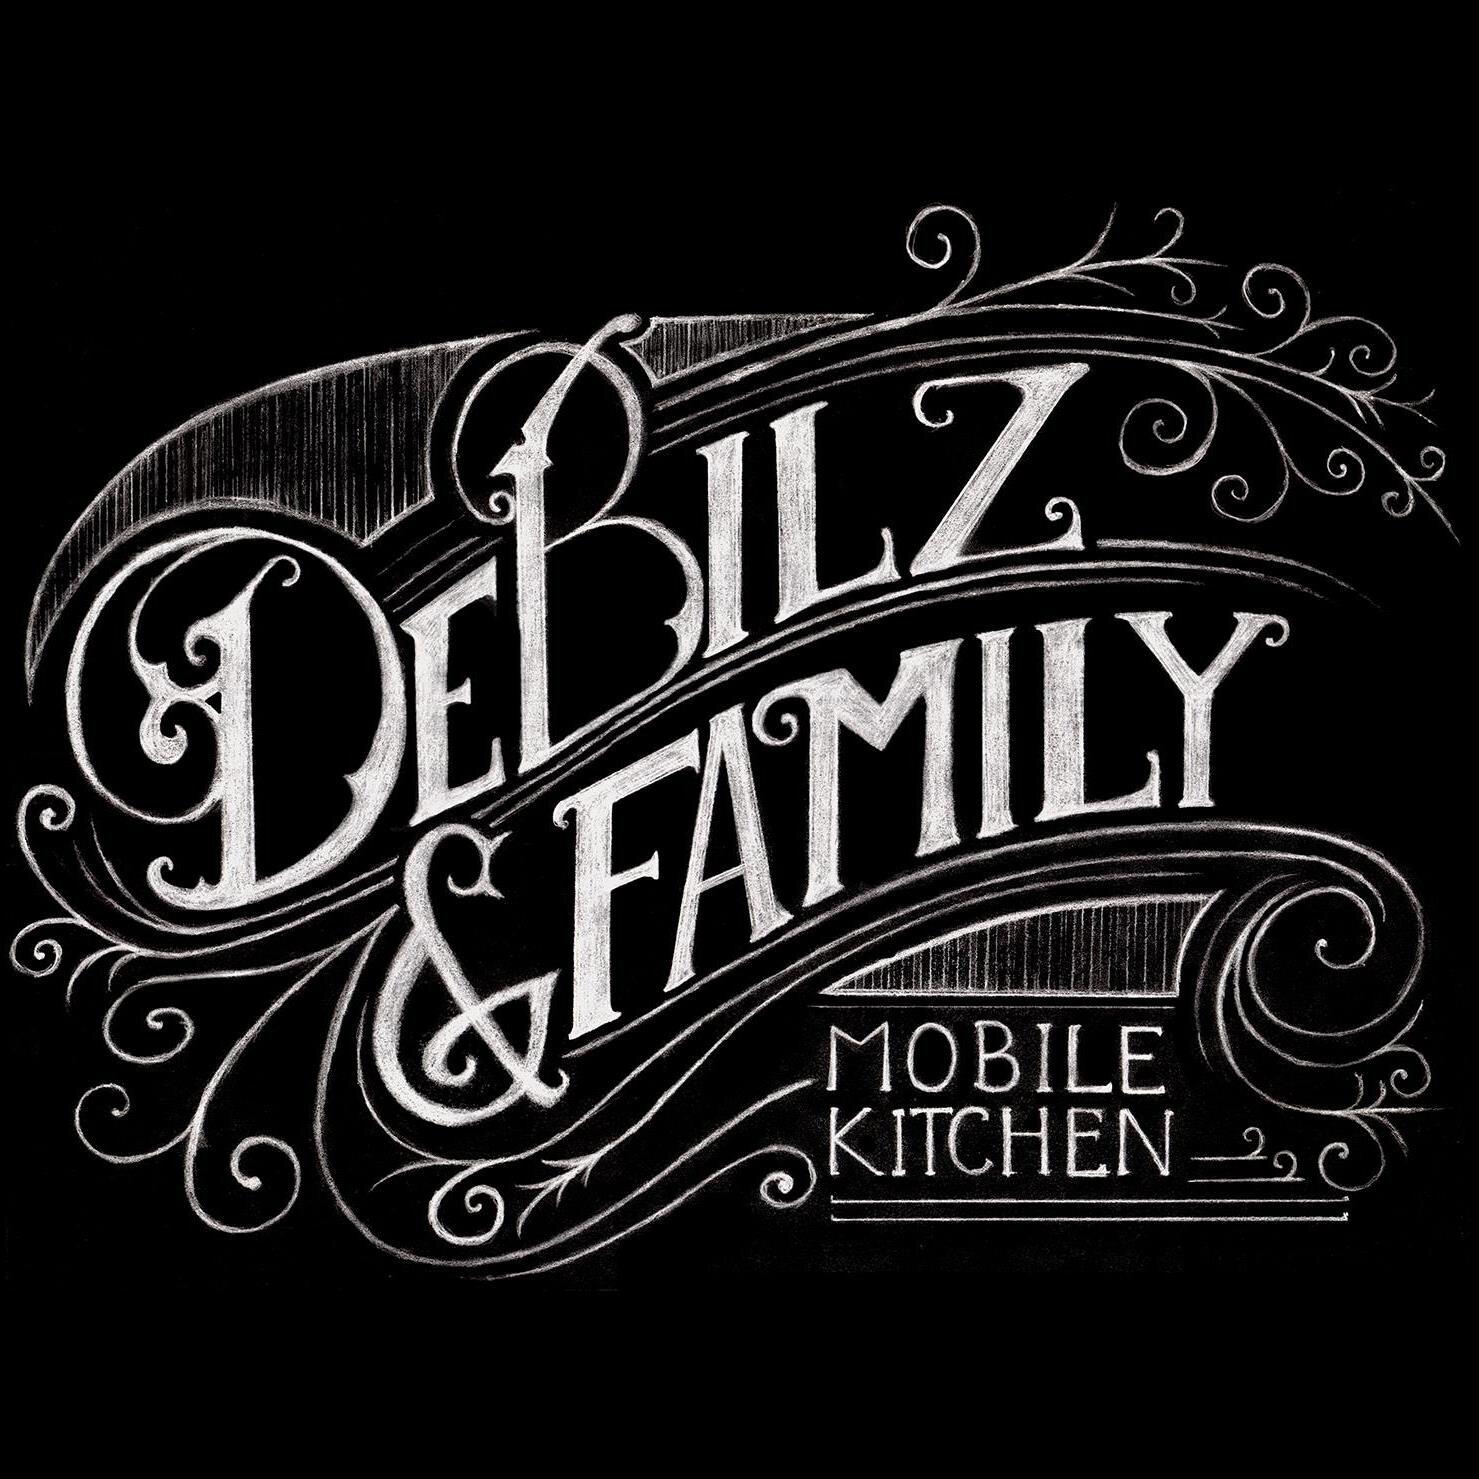 DeBilz Logo.jpg